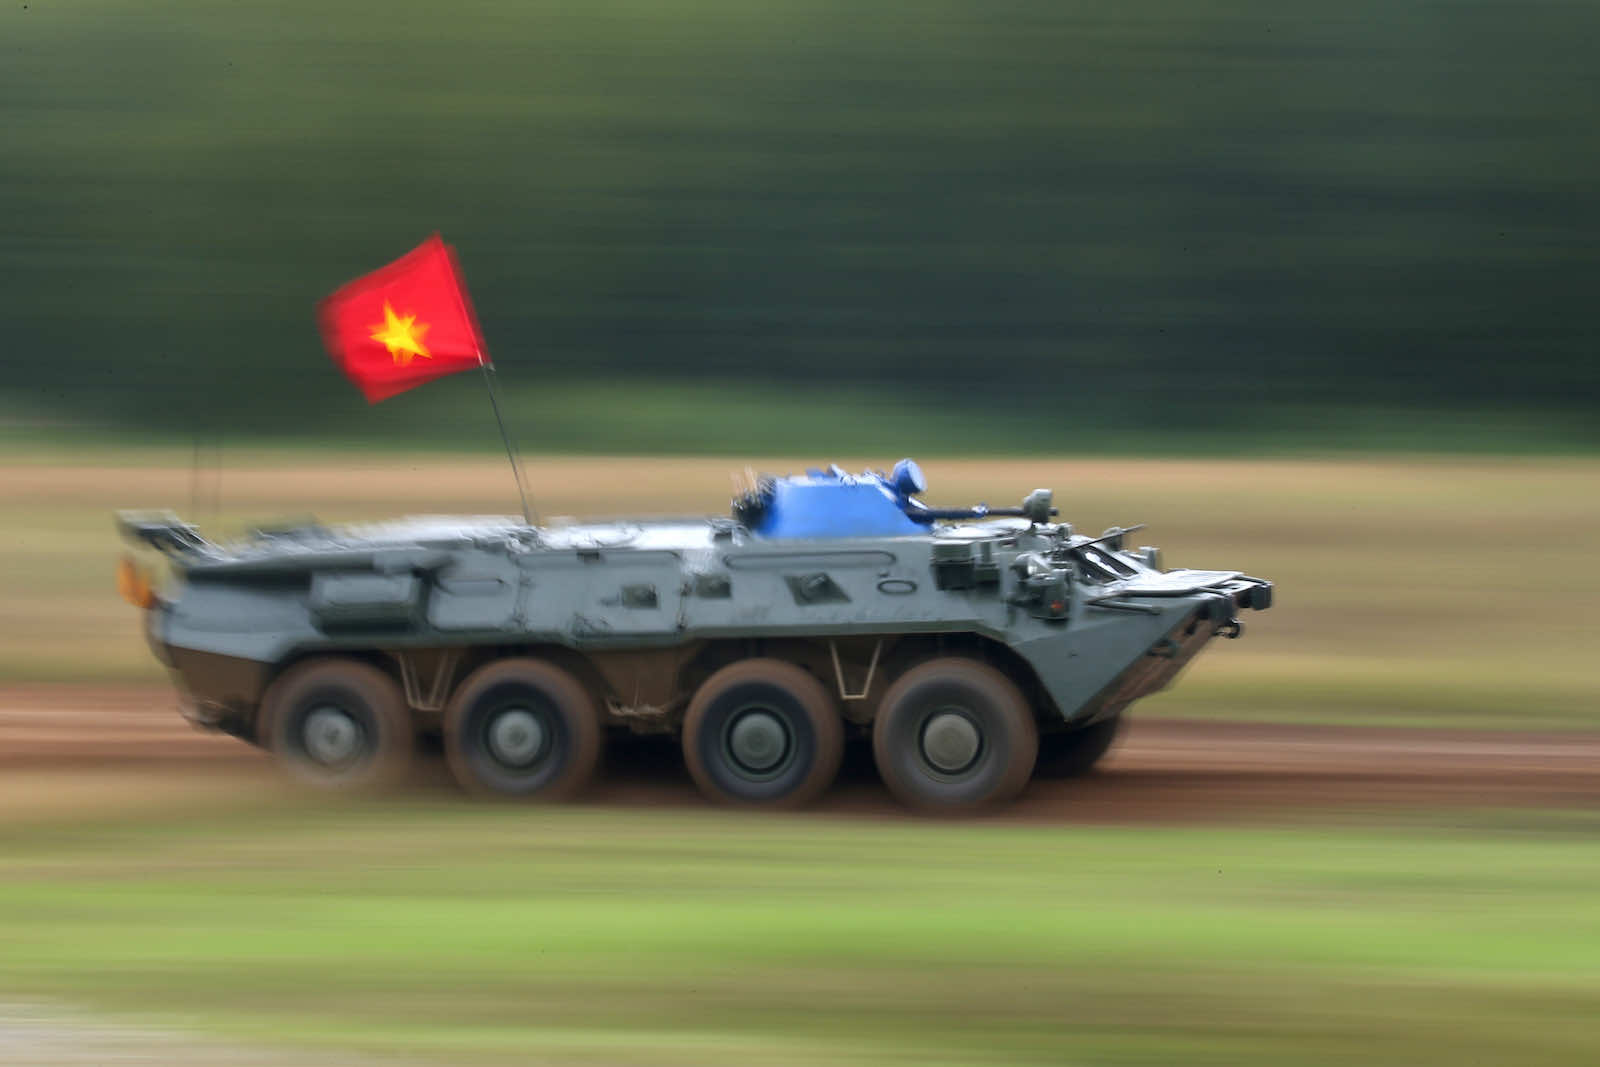 Vietnam's RKhM-4 NBC reconnaissance vehicle at the 2020 International Army Games, at Pesochnoye, Russia (Vladimir Smirnov\TASS via Getty Images)